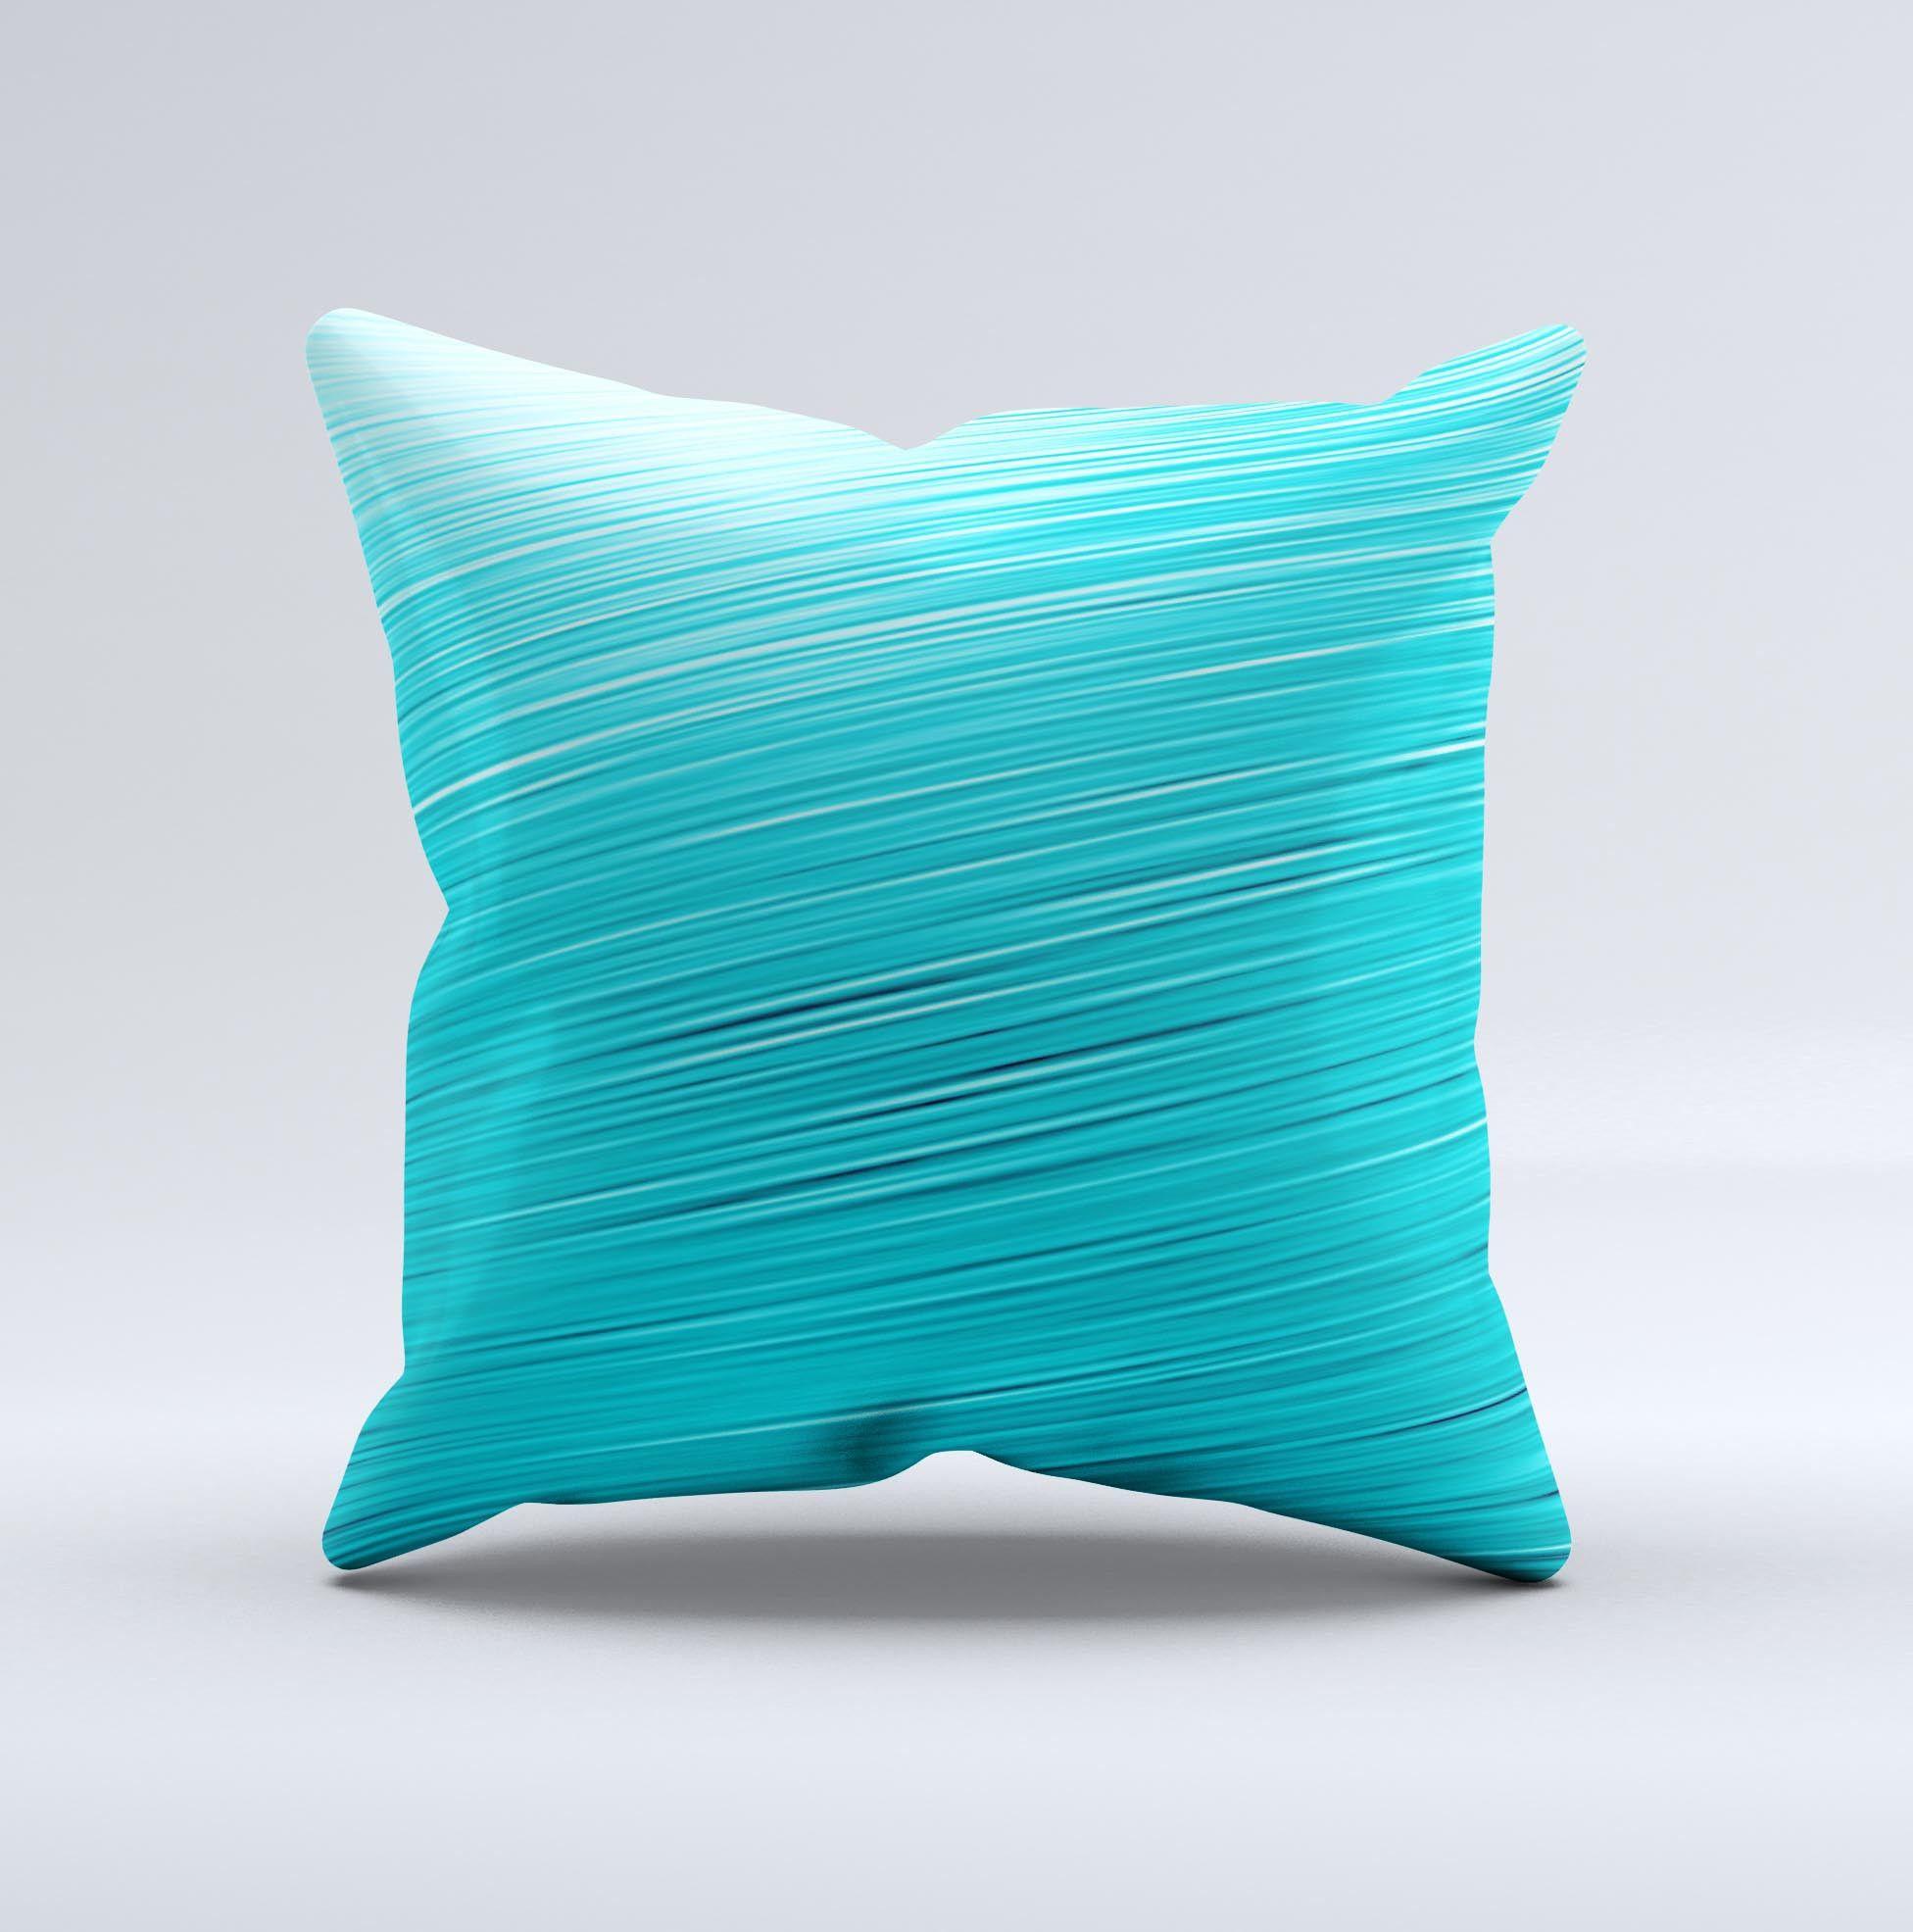 Light Blue Slanted Streaks ink-Fuzed Decorative Throw Pillow from DesignSkinz